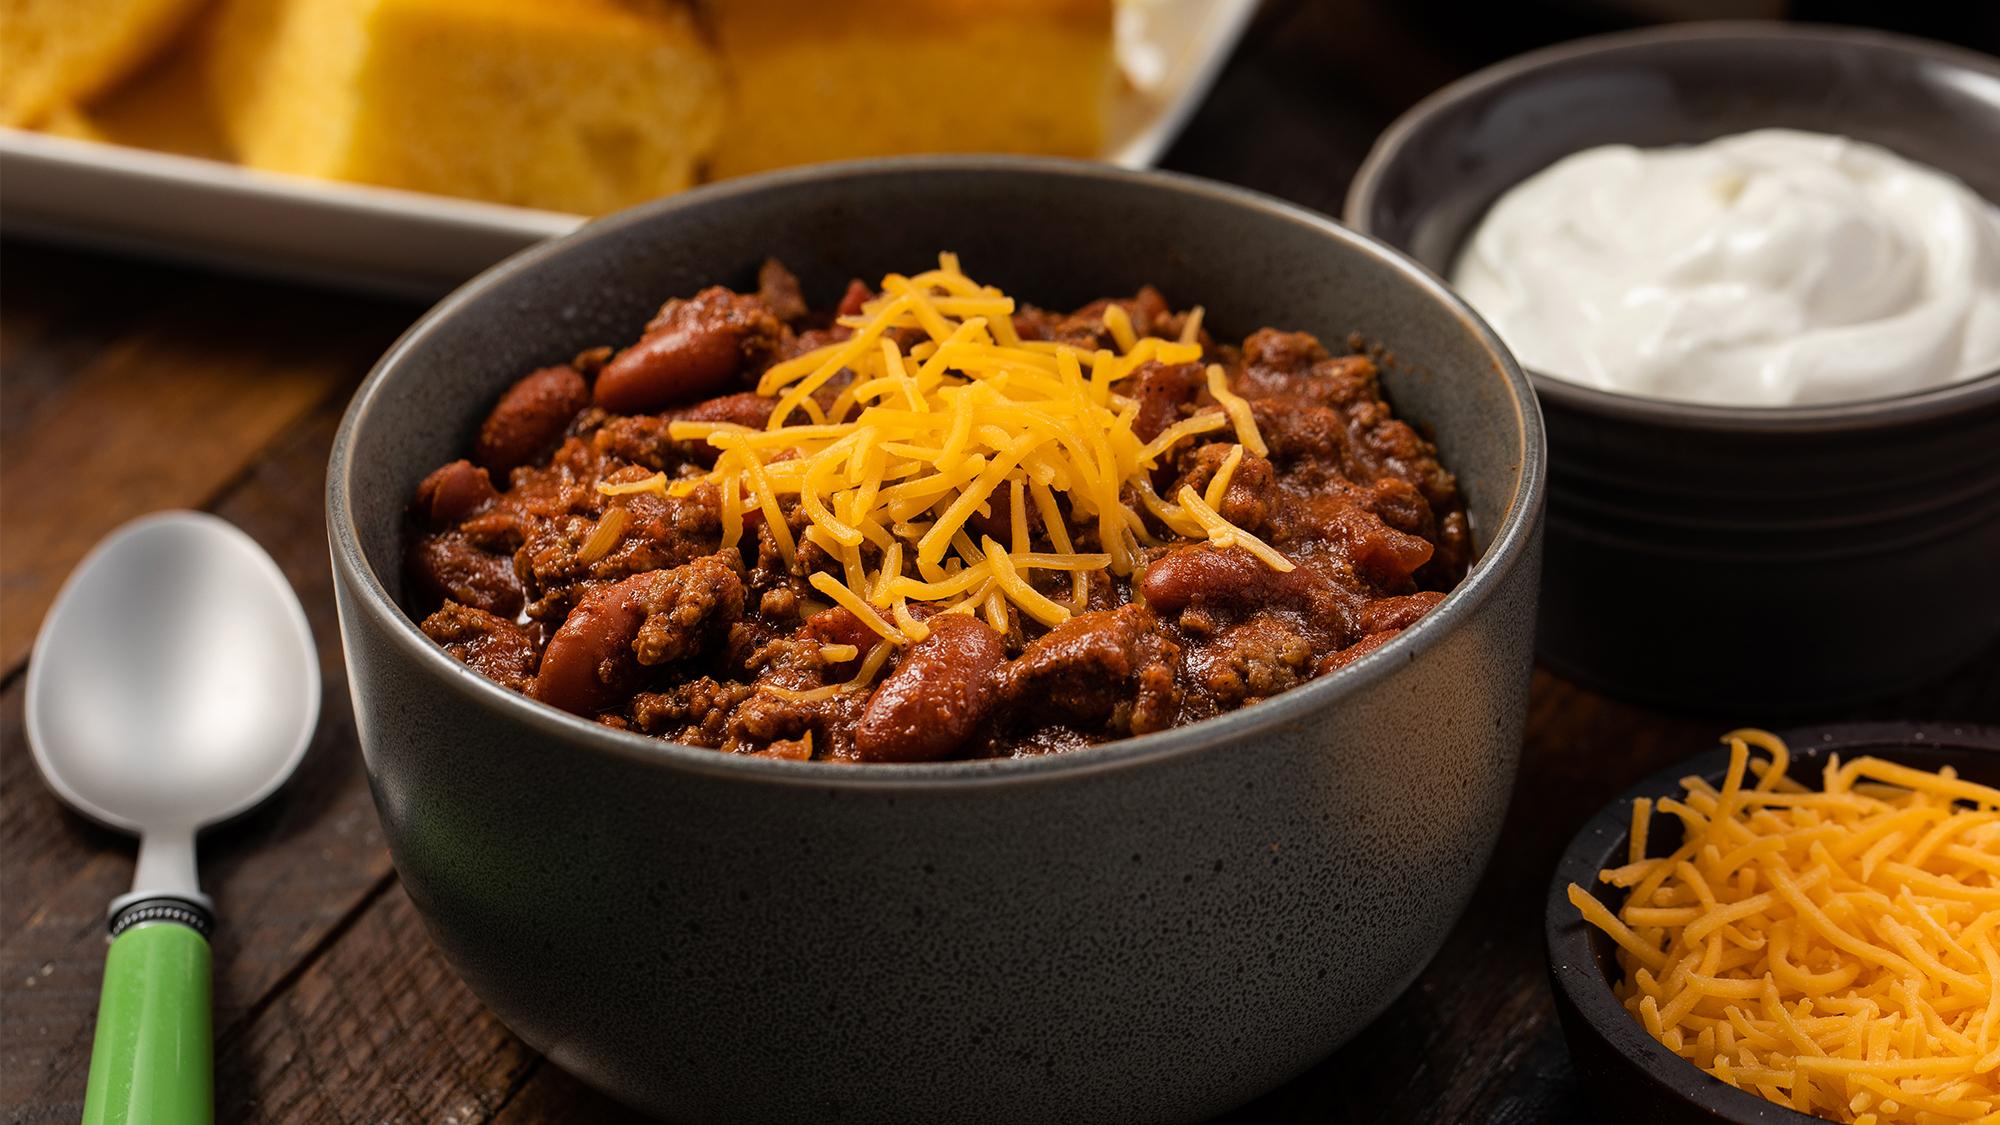 McCormick Instant Pot® Chili